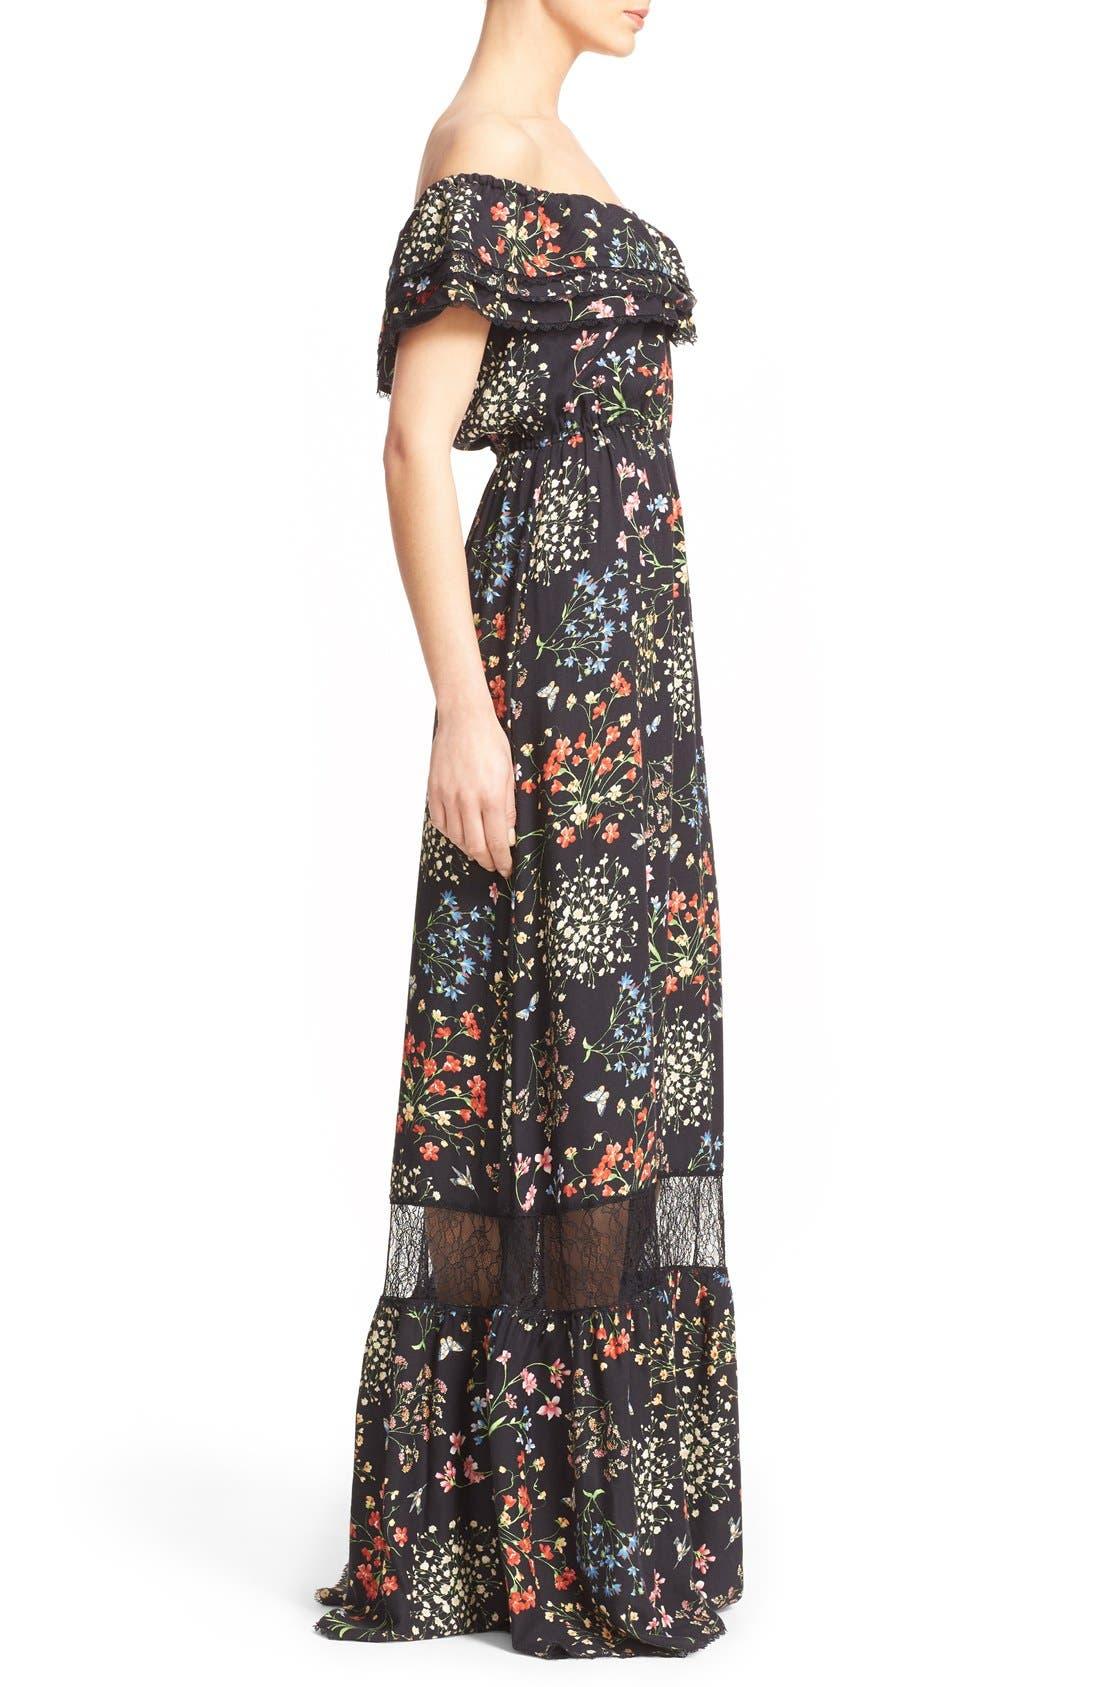 'Cheri' Floral Print Off the Shoulder Maxi Dress,                             Alternate thumbnail 2, color,                             002